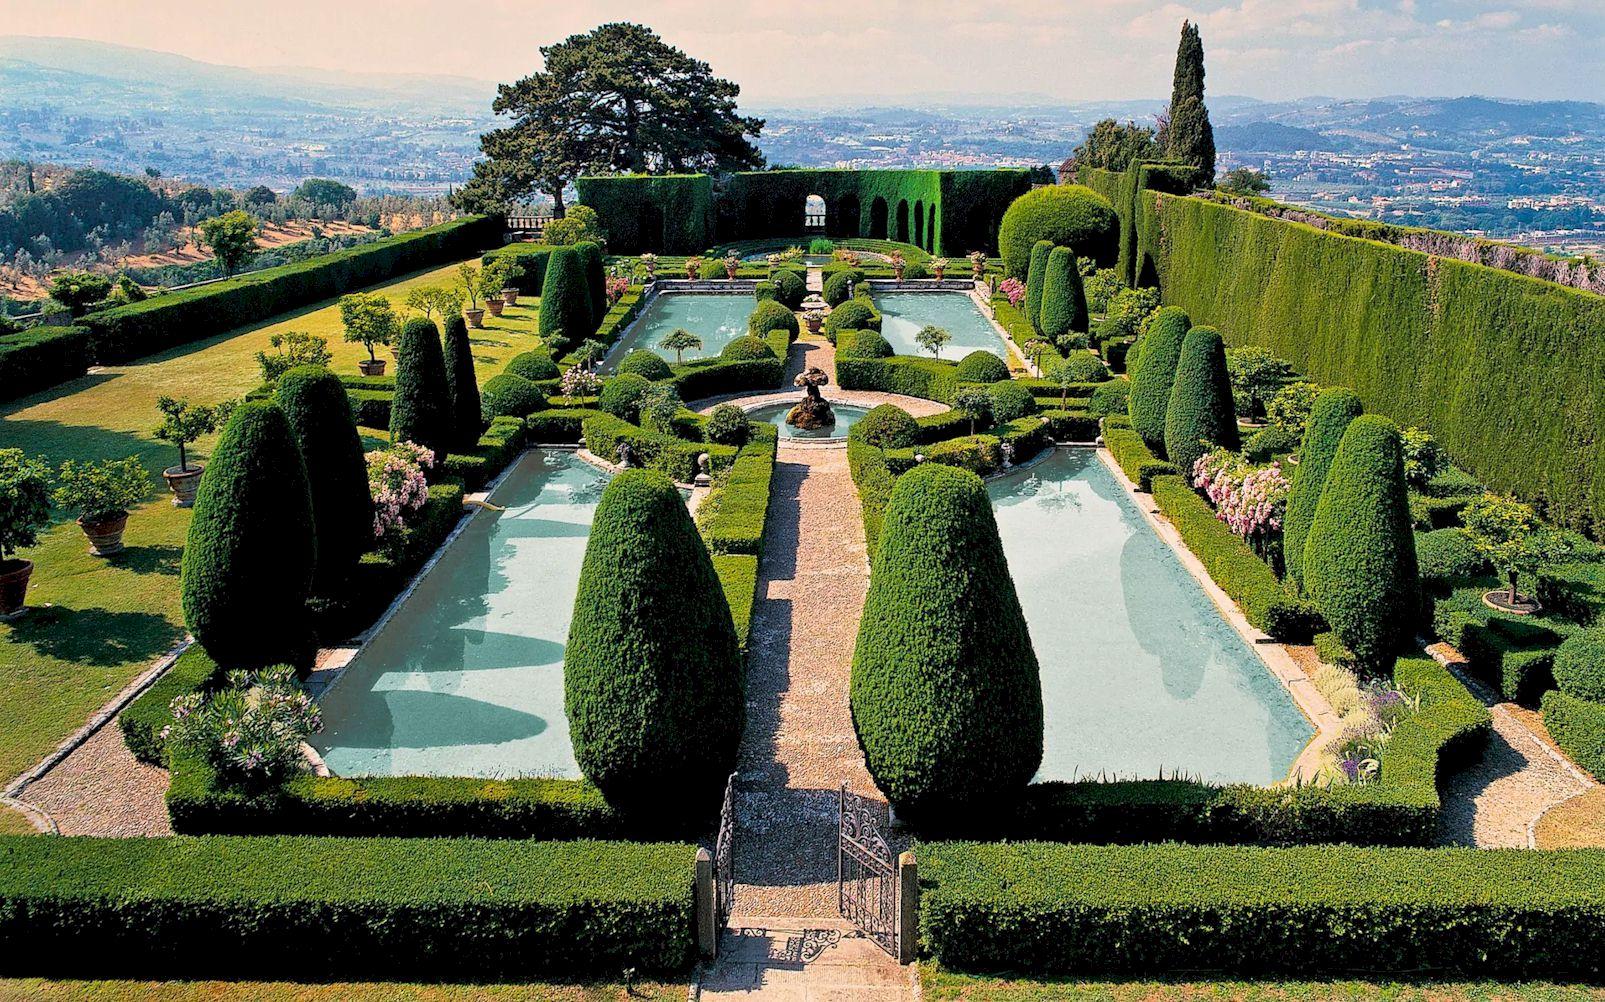 Villa Gamberaia garden visit